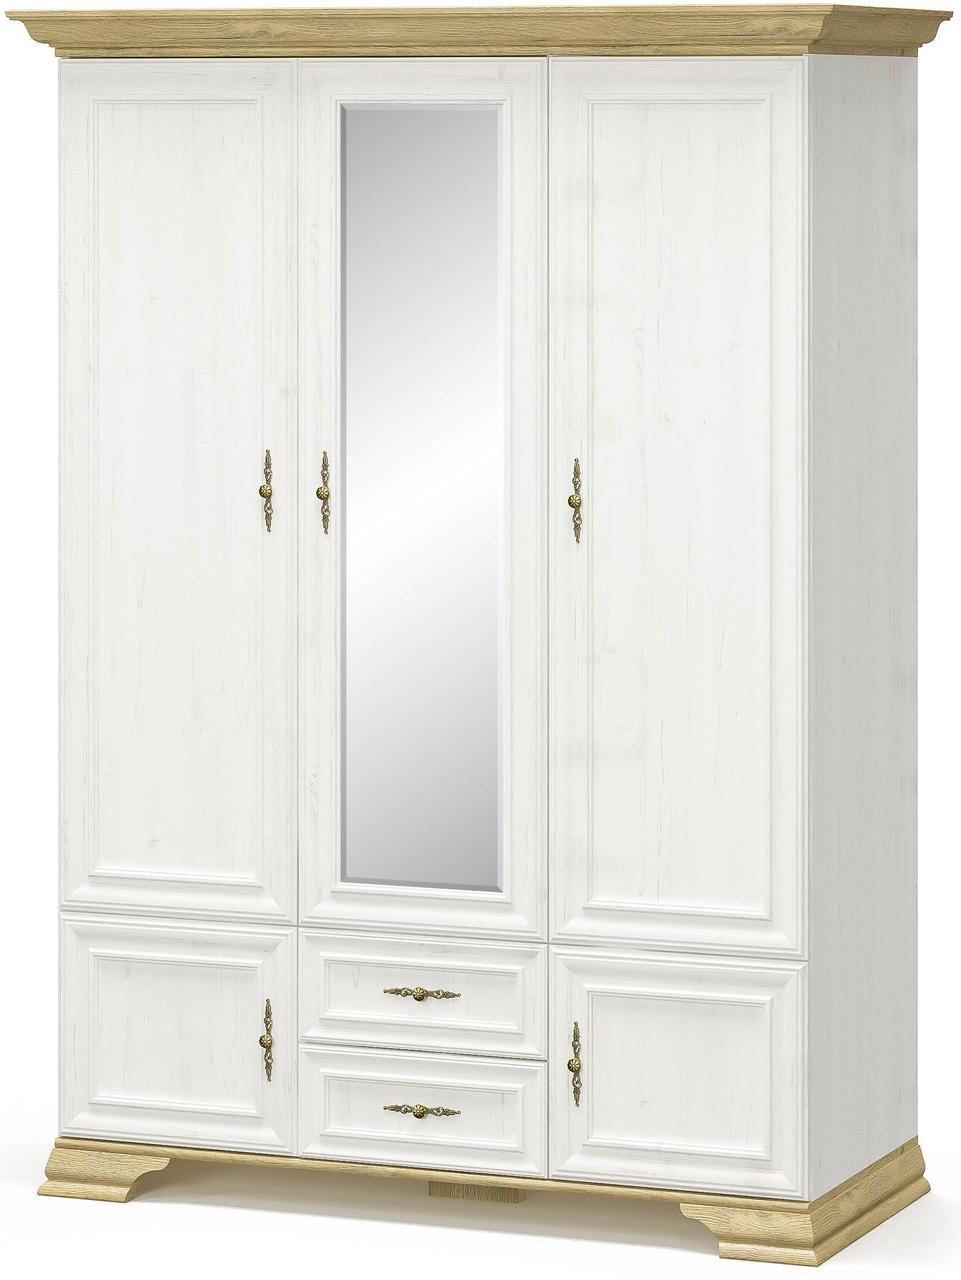 Шкаф 3Д МАКС Ирис Андерсон пайн + Дуб золотой Мебель Сервис (145.1х62.2х212 см)